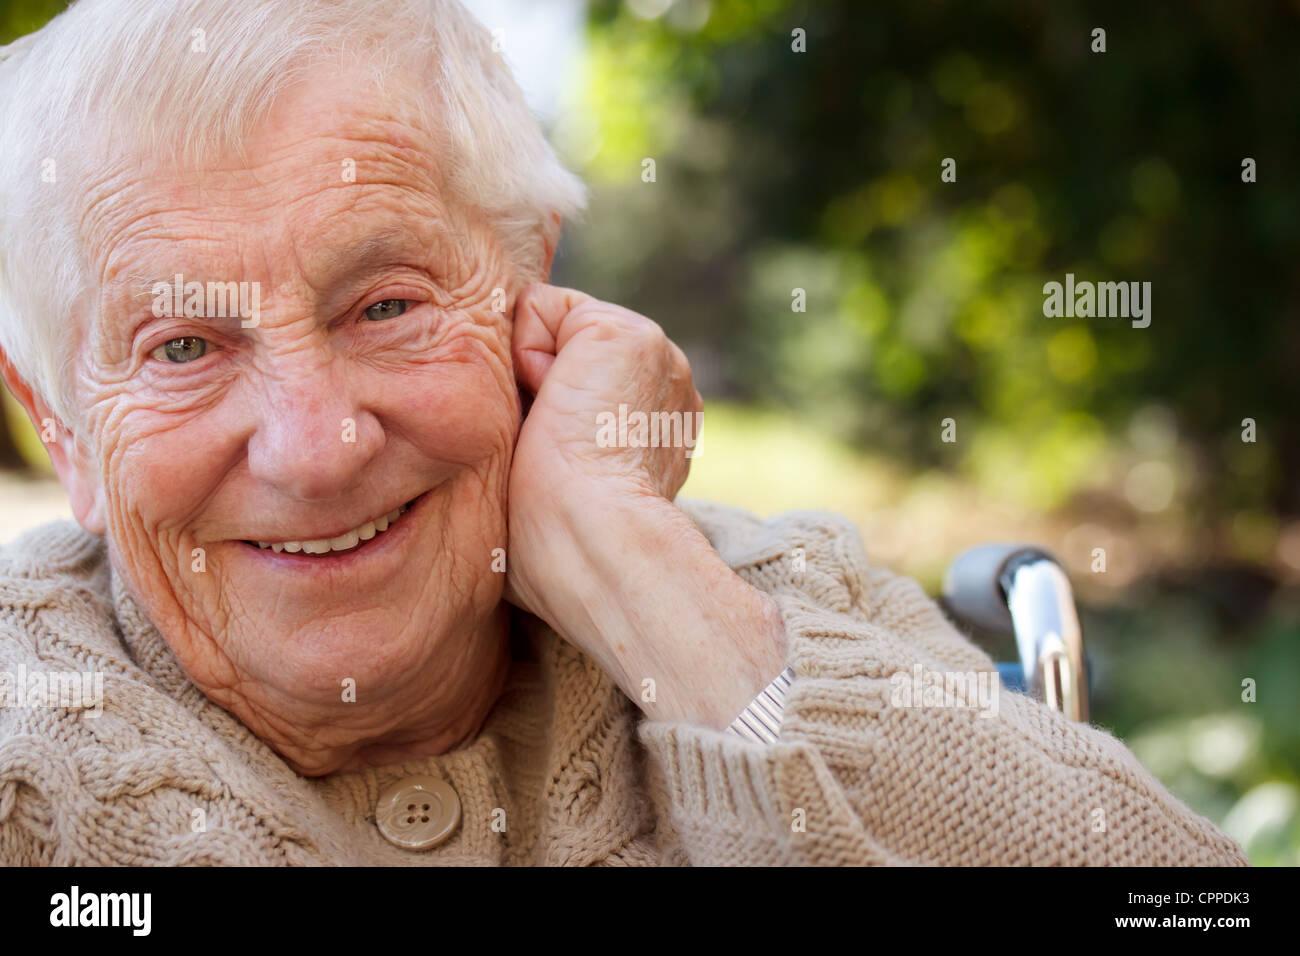 Senior Woman Smiling in Wheelchair - Stock Image